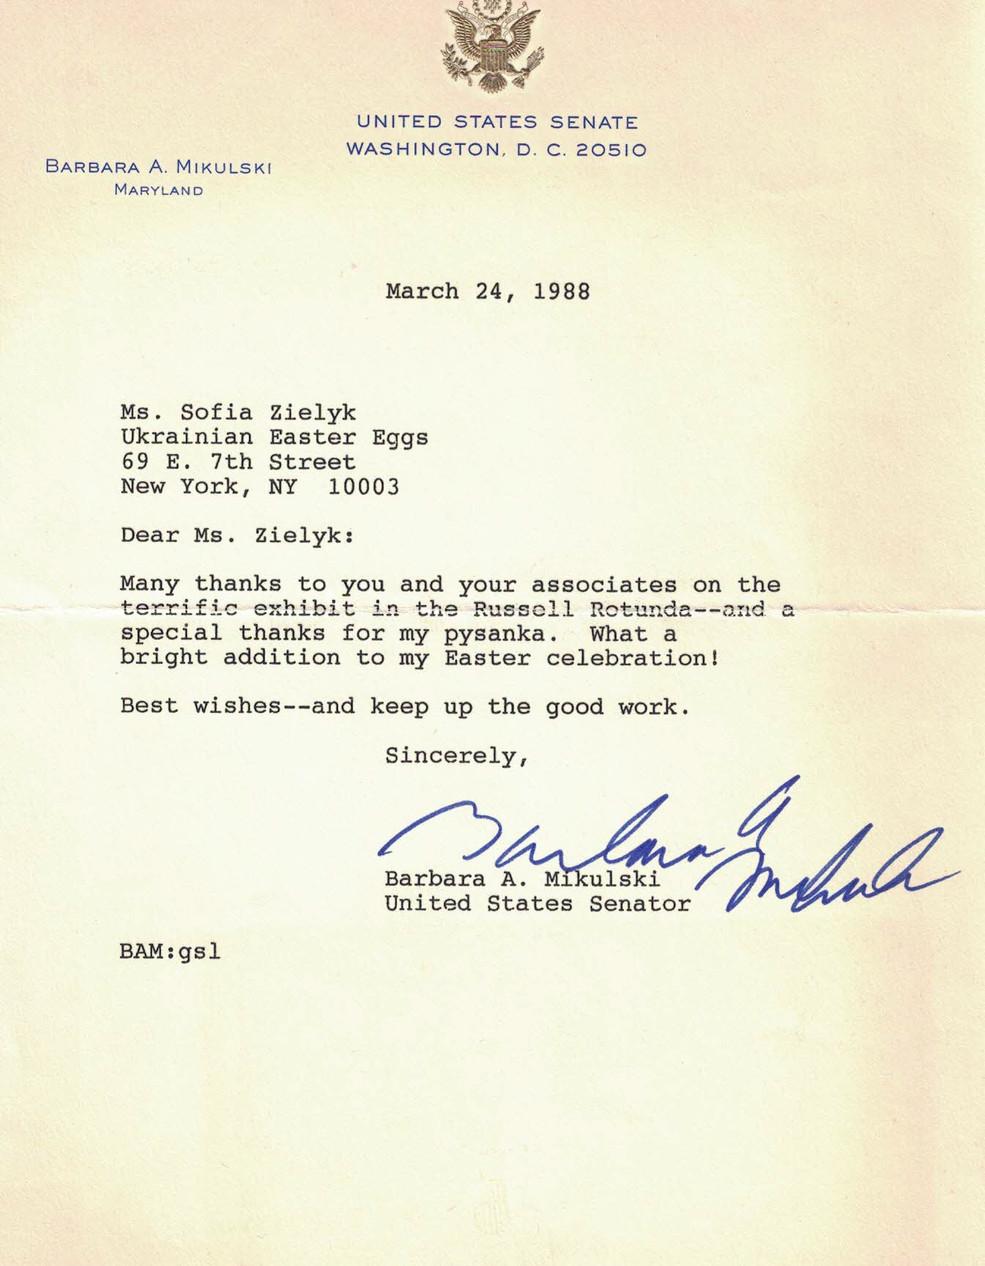 Thank-you note  from  Senator Barbara A. Mikulski of Maryland